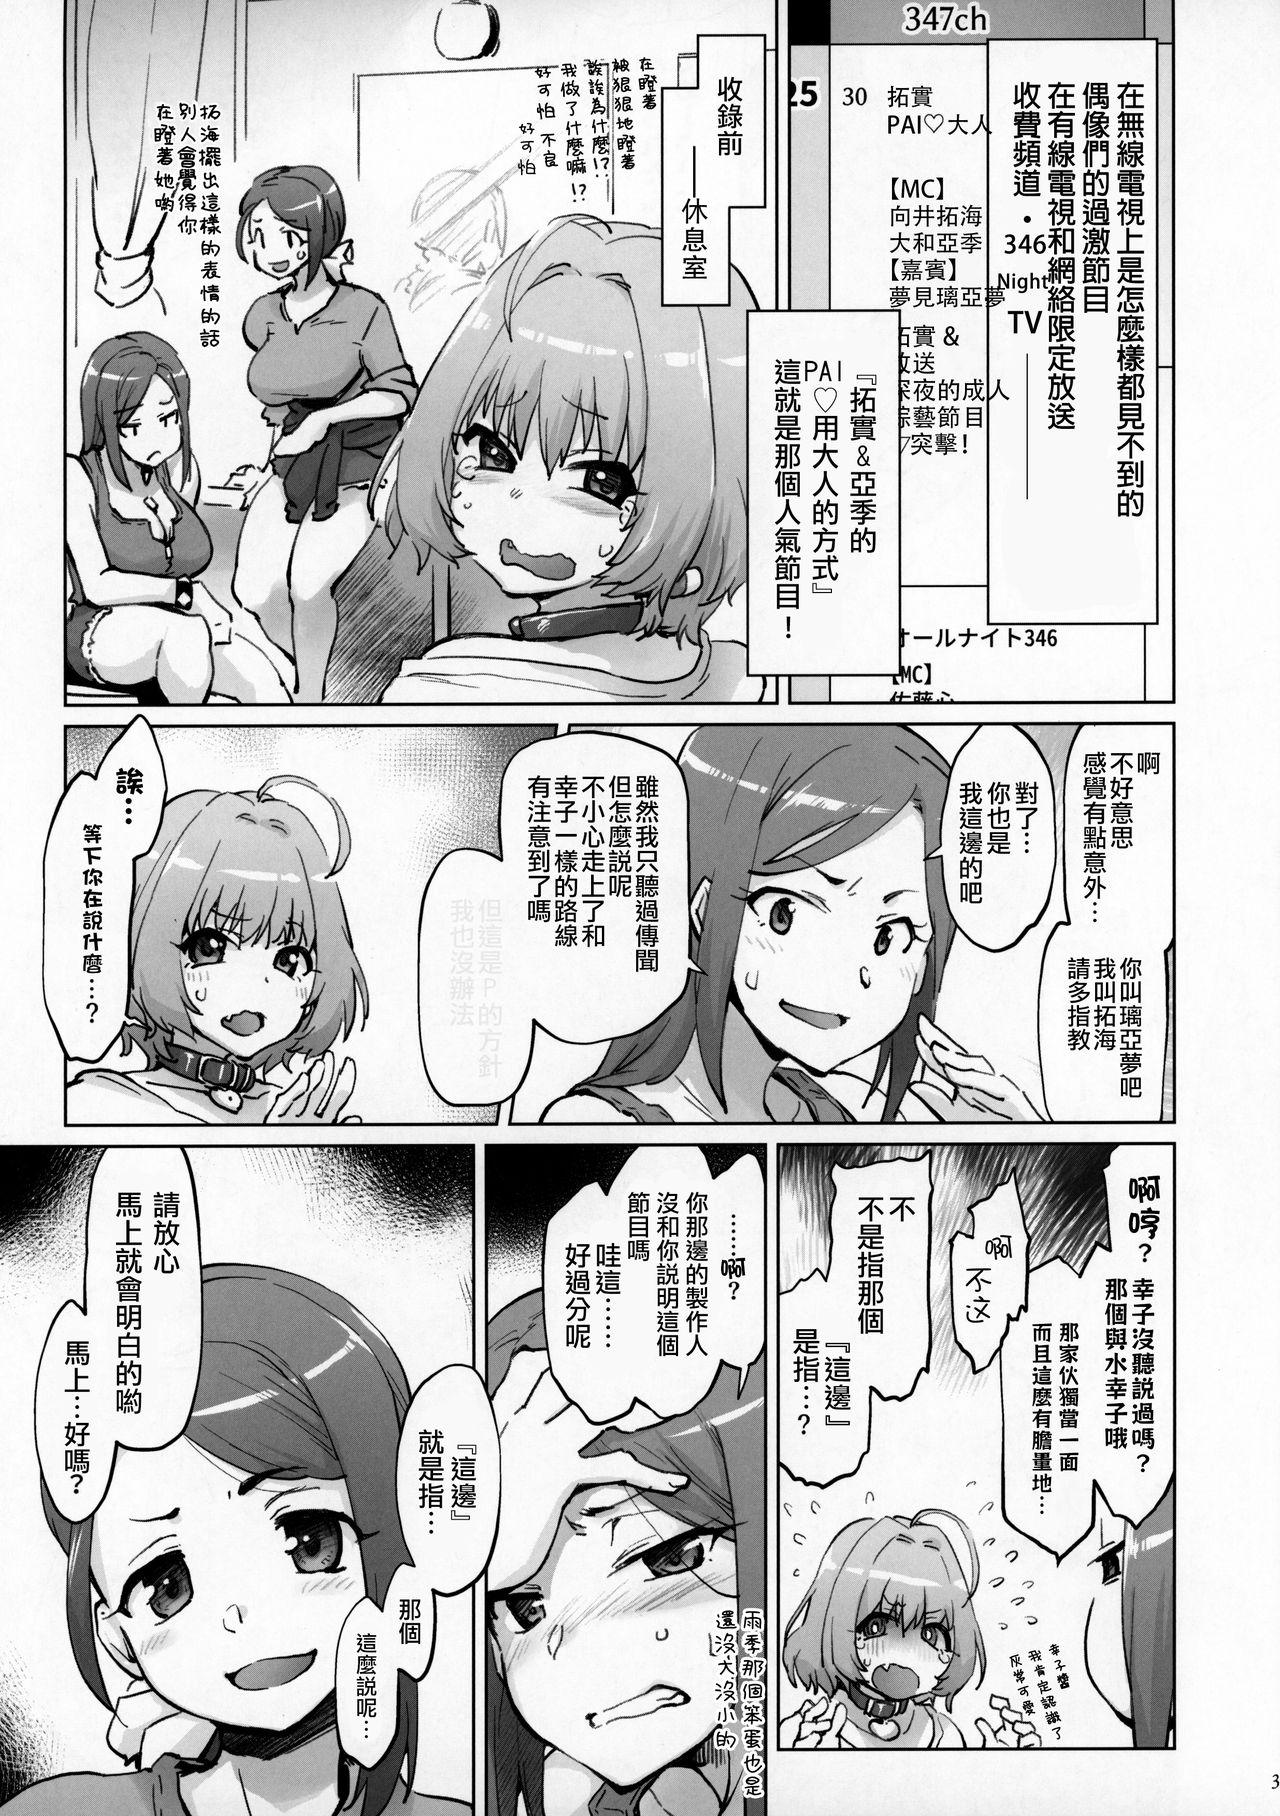 Takumin & Aki no PAI MANISH NIGHT 2